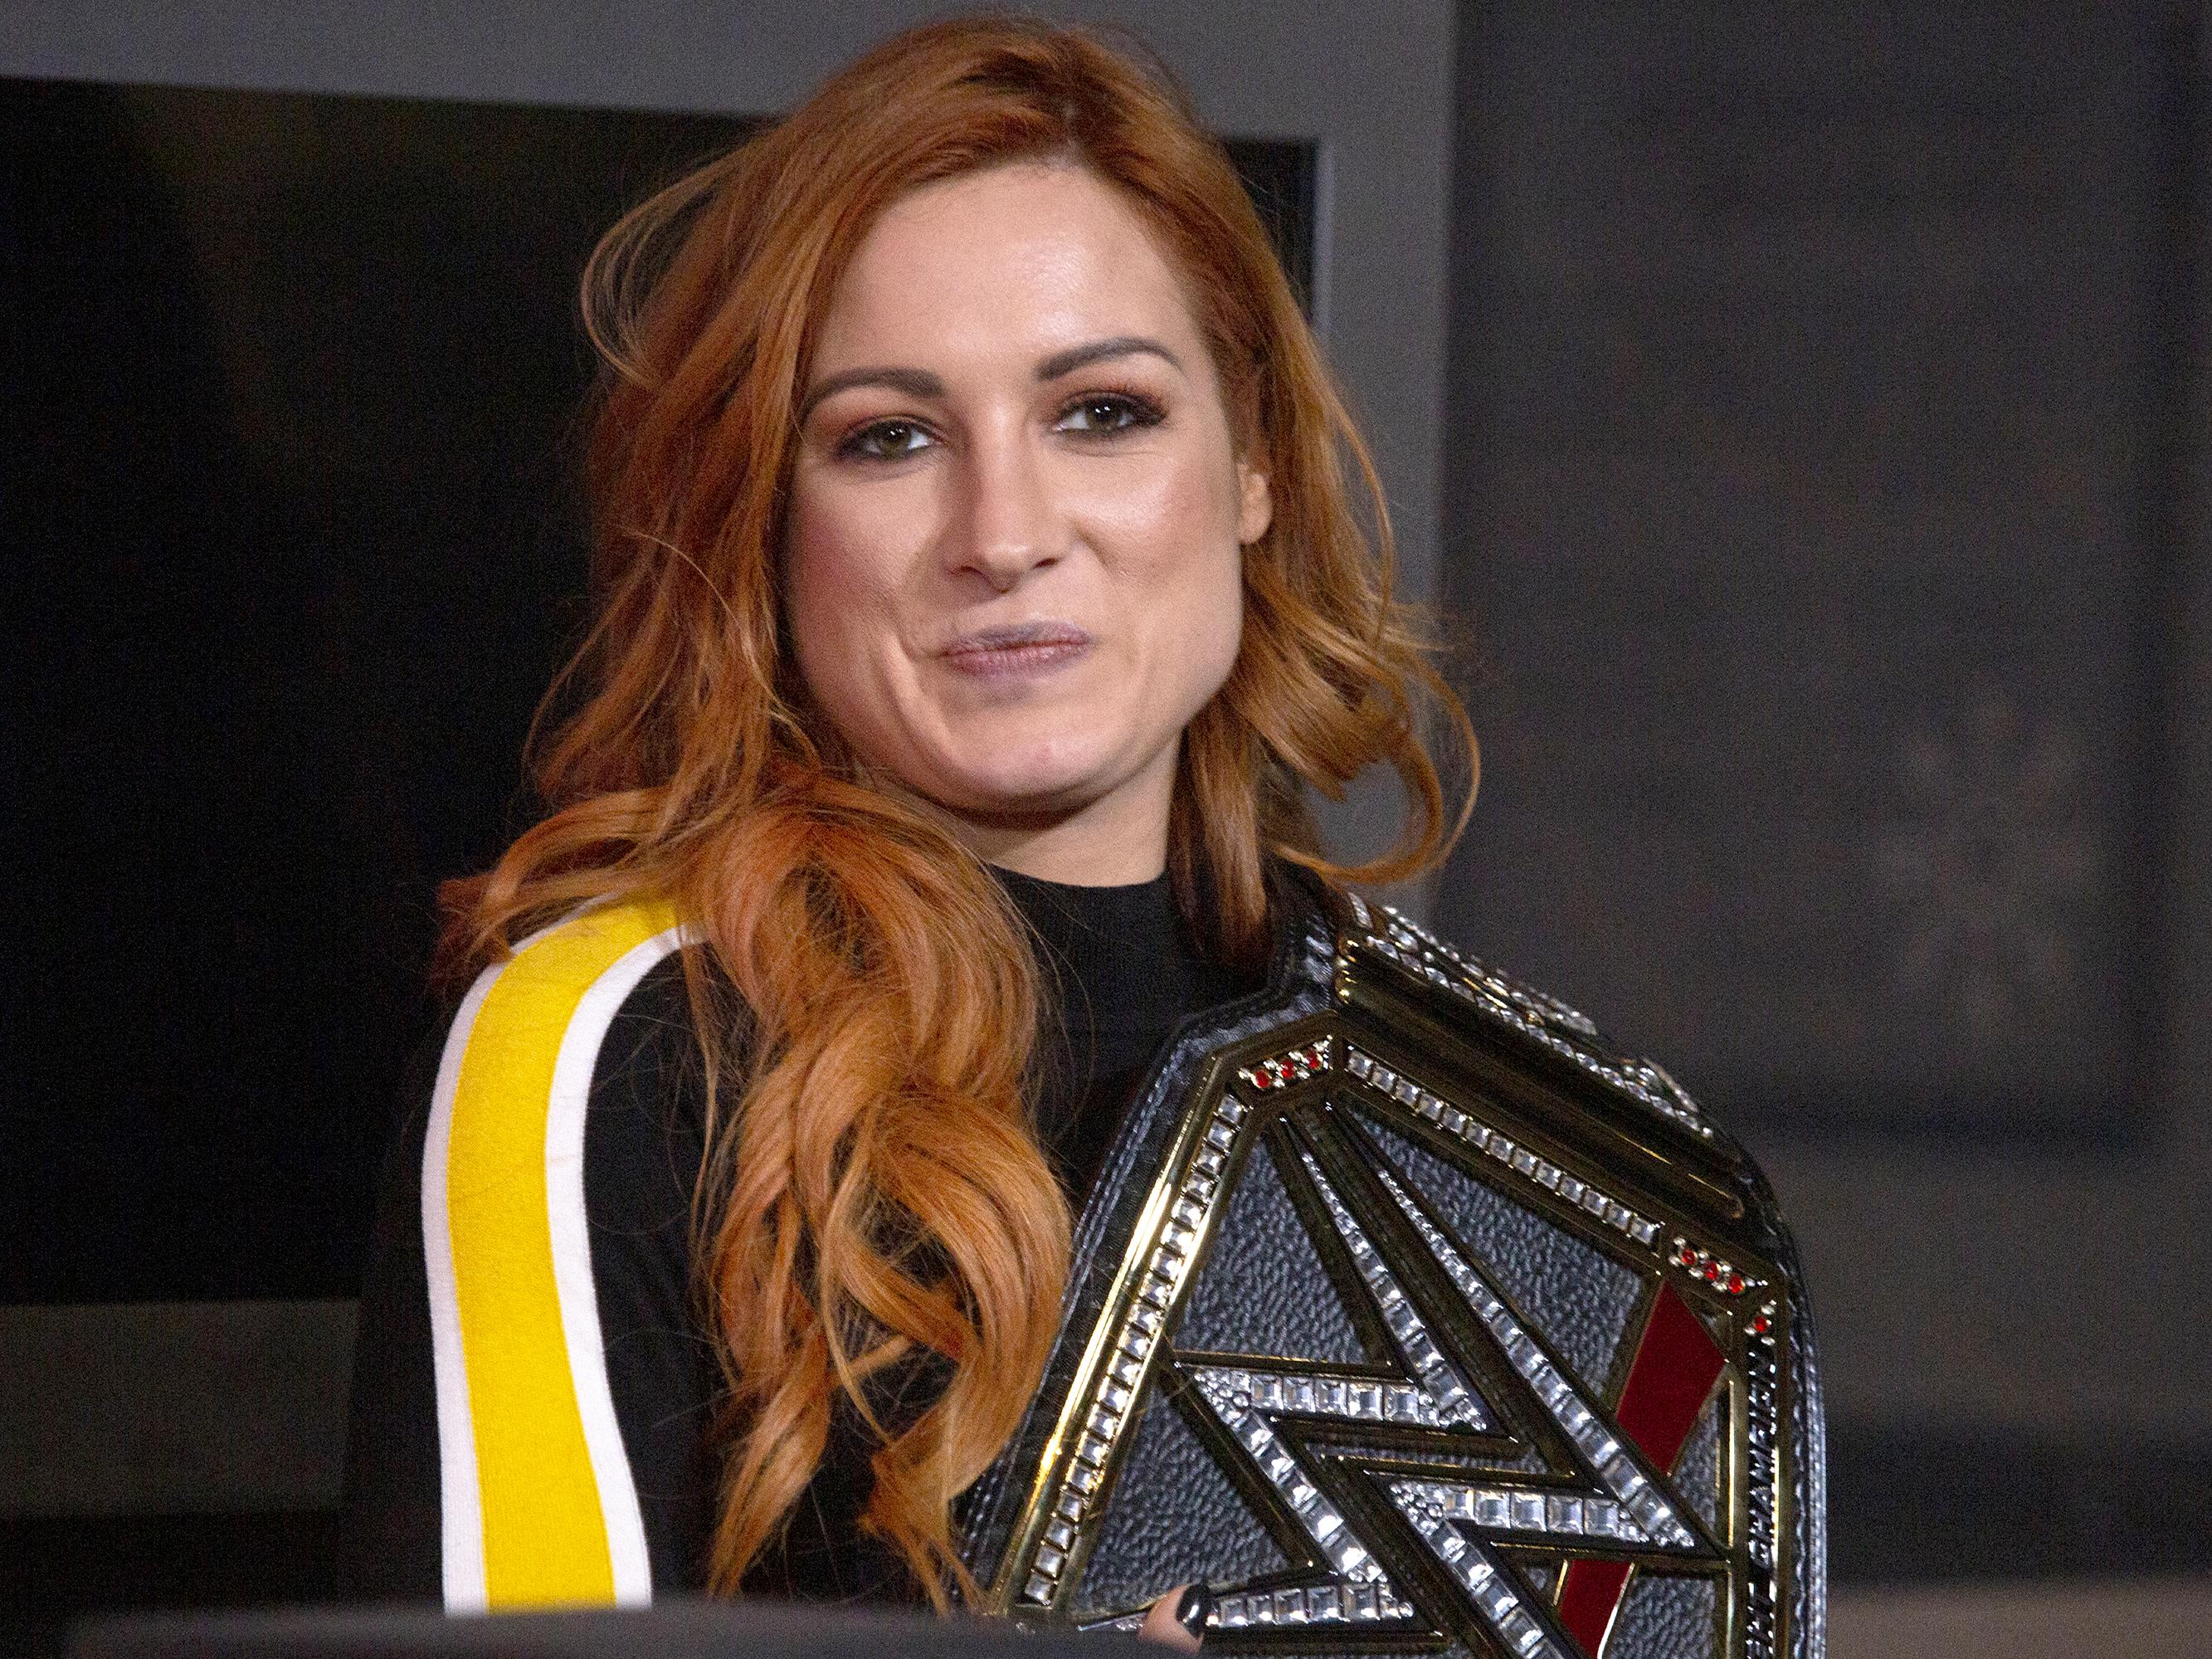 WWE Superstars Celebrate Wrestlemania 35